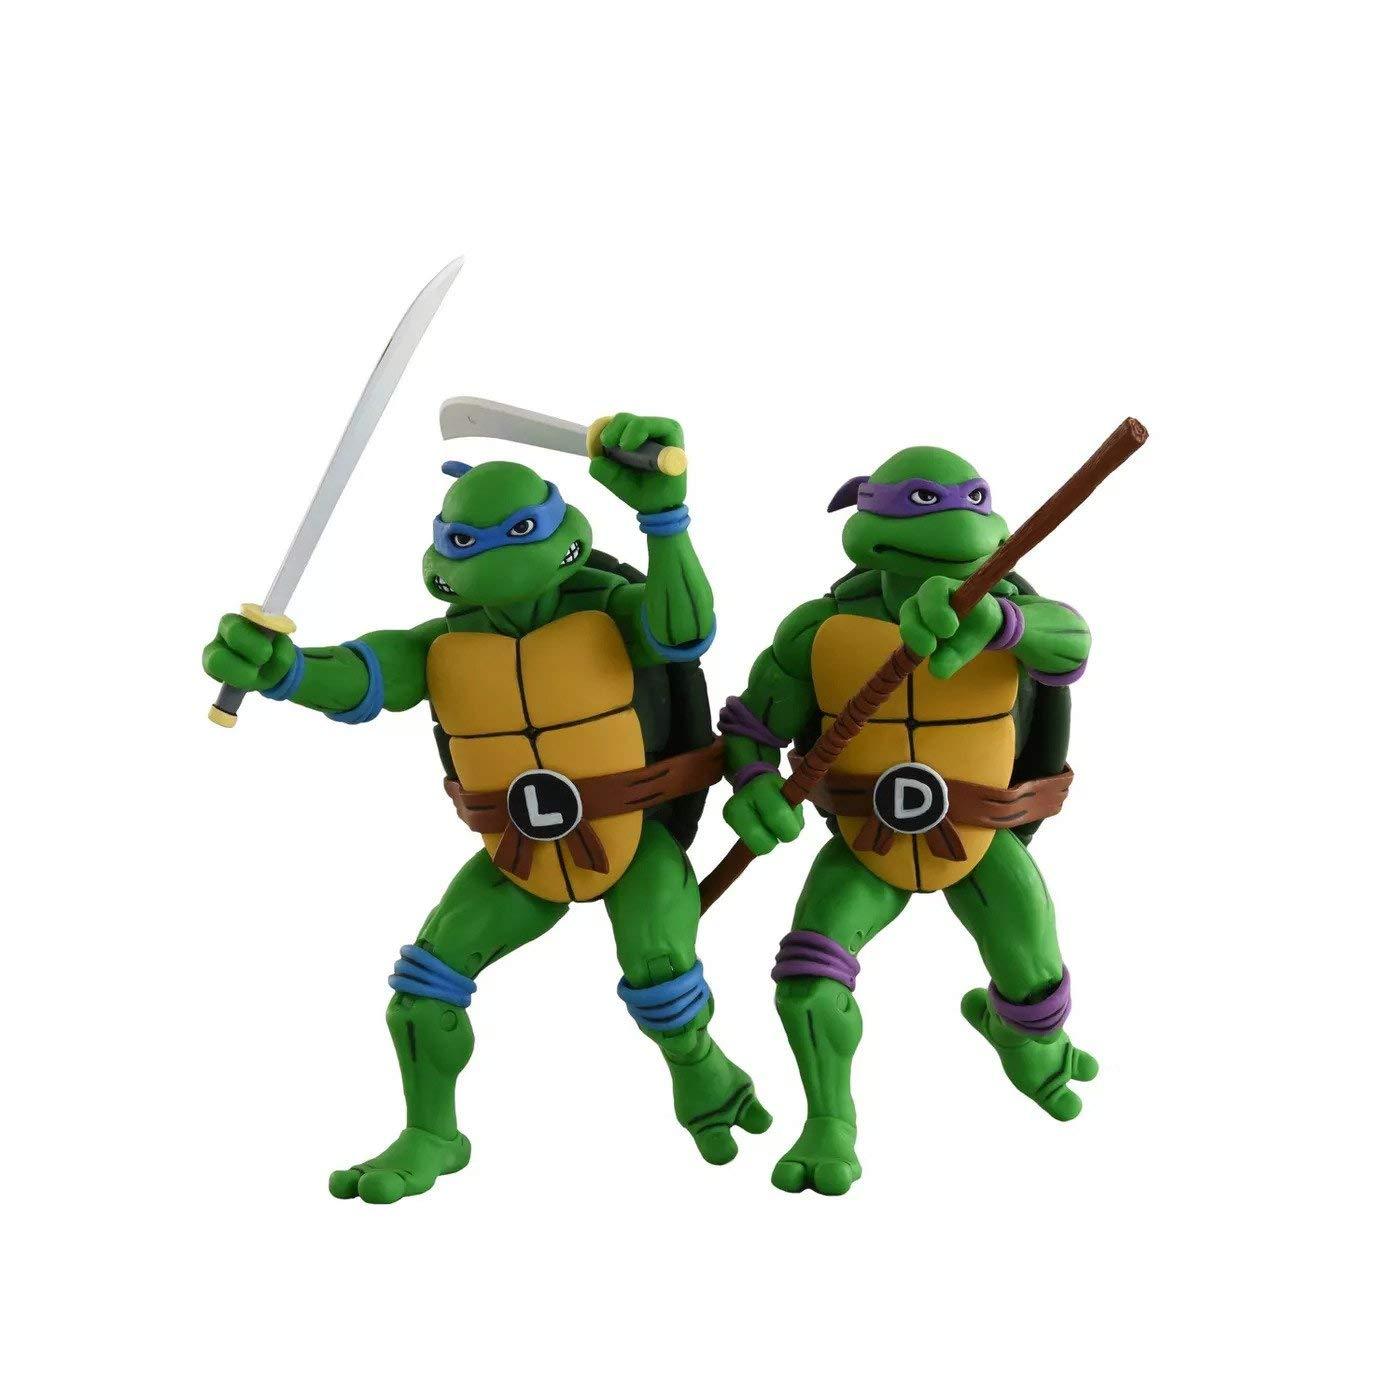 "NECA Teenage Mutant Ninja Turtles Leonardo and Donatello (Classic Cartoon) 7"" Action Figure 2 Pack Target Exclusive"